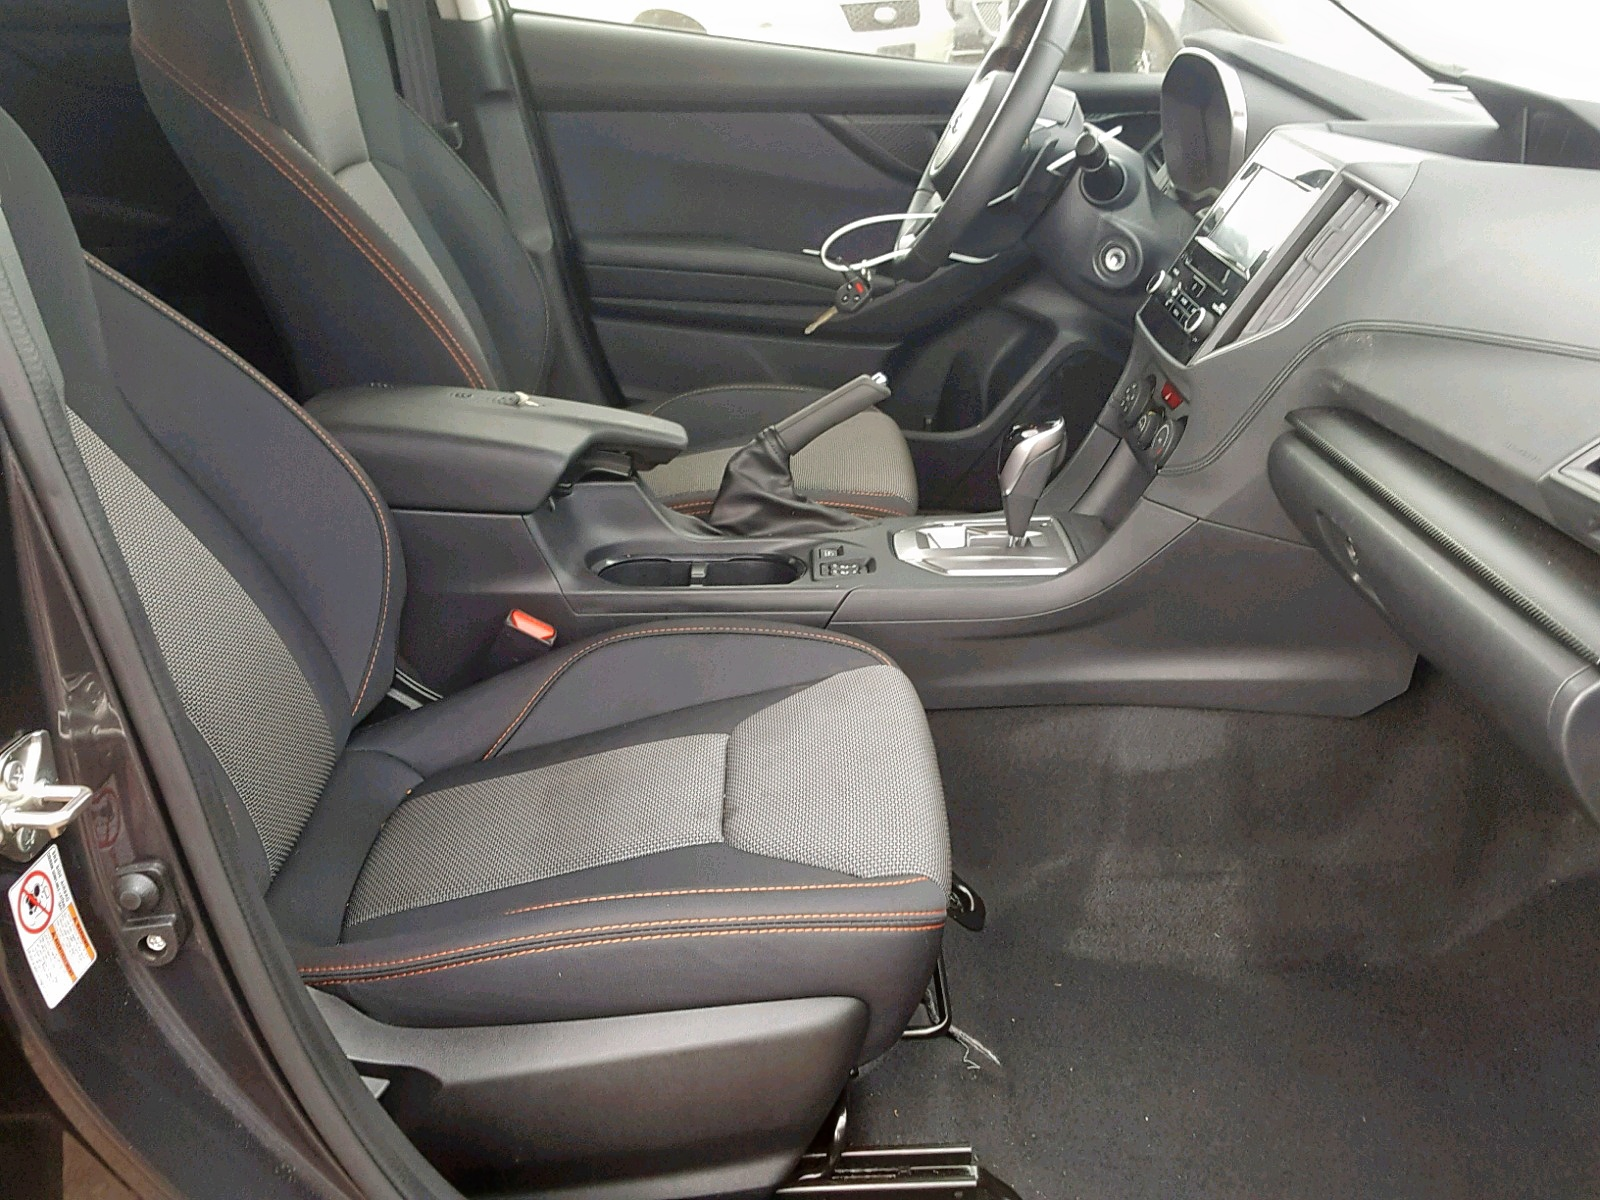 Pleasant Subaru Crosstrek 2019 Jf2Gtaec8Kh325628 Auto Auction Spot Ibusinesslaw Wood Chair Design Ideas Ibusinesslaworg